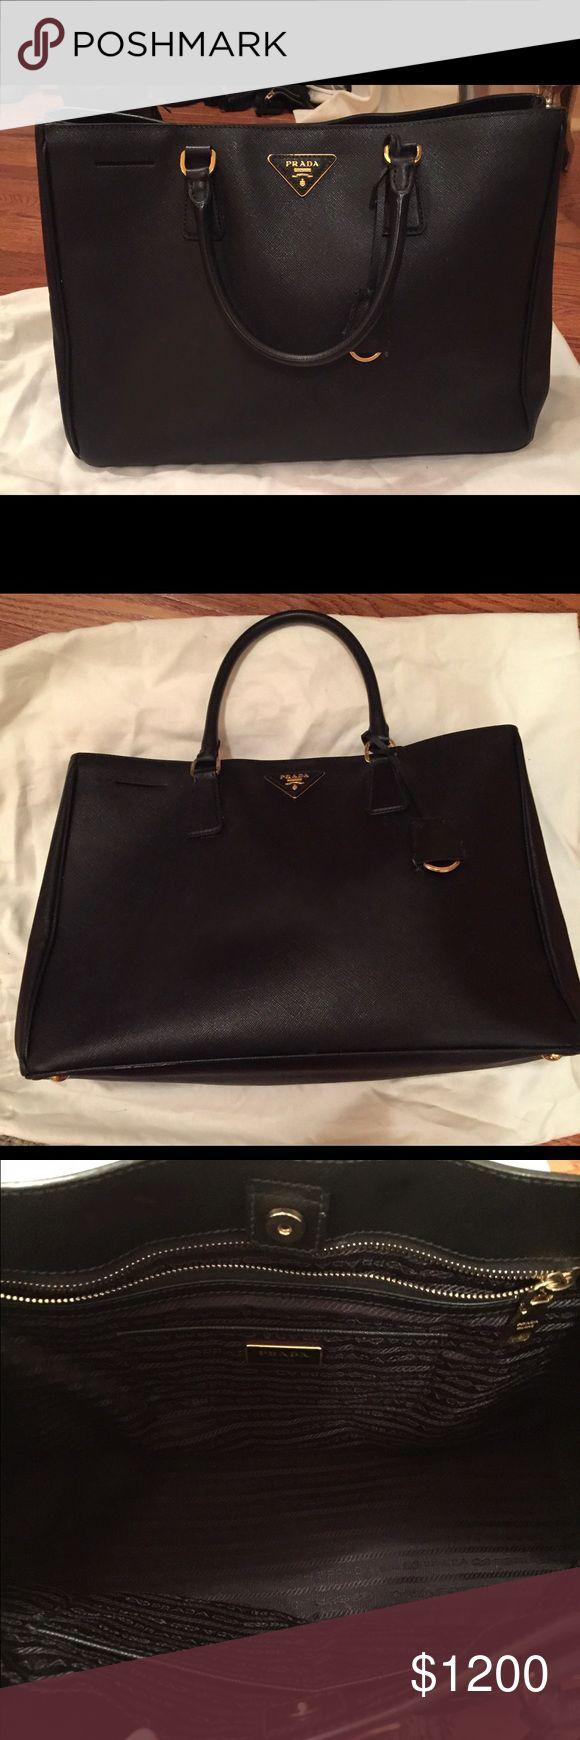 Prada bag Great condition black Prada bag. Still for sale in stores Prada Bags Totes